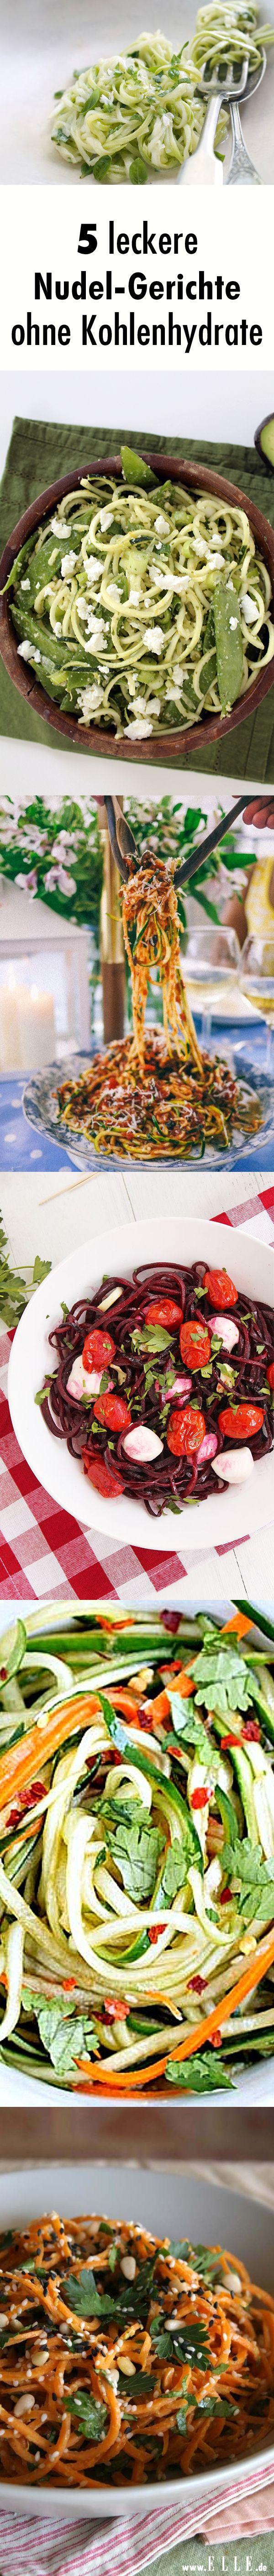 Gemüsenudeln: 5 Rezepte für Nudeln ohne Kohlenhydrate